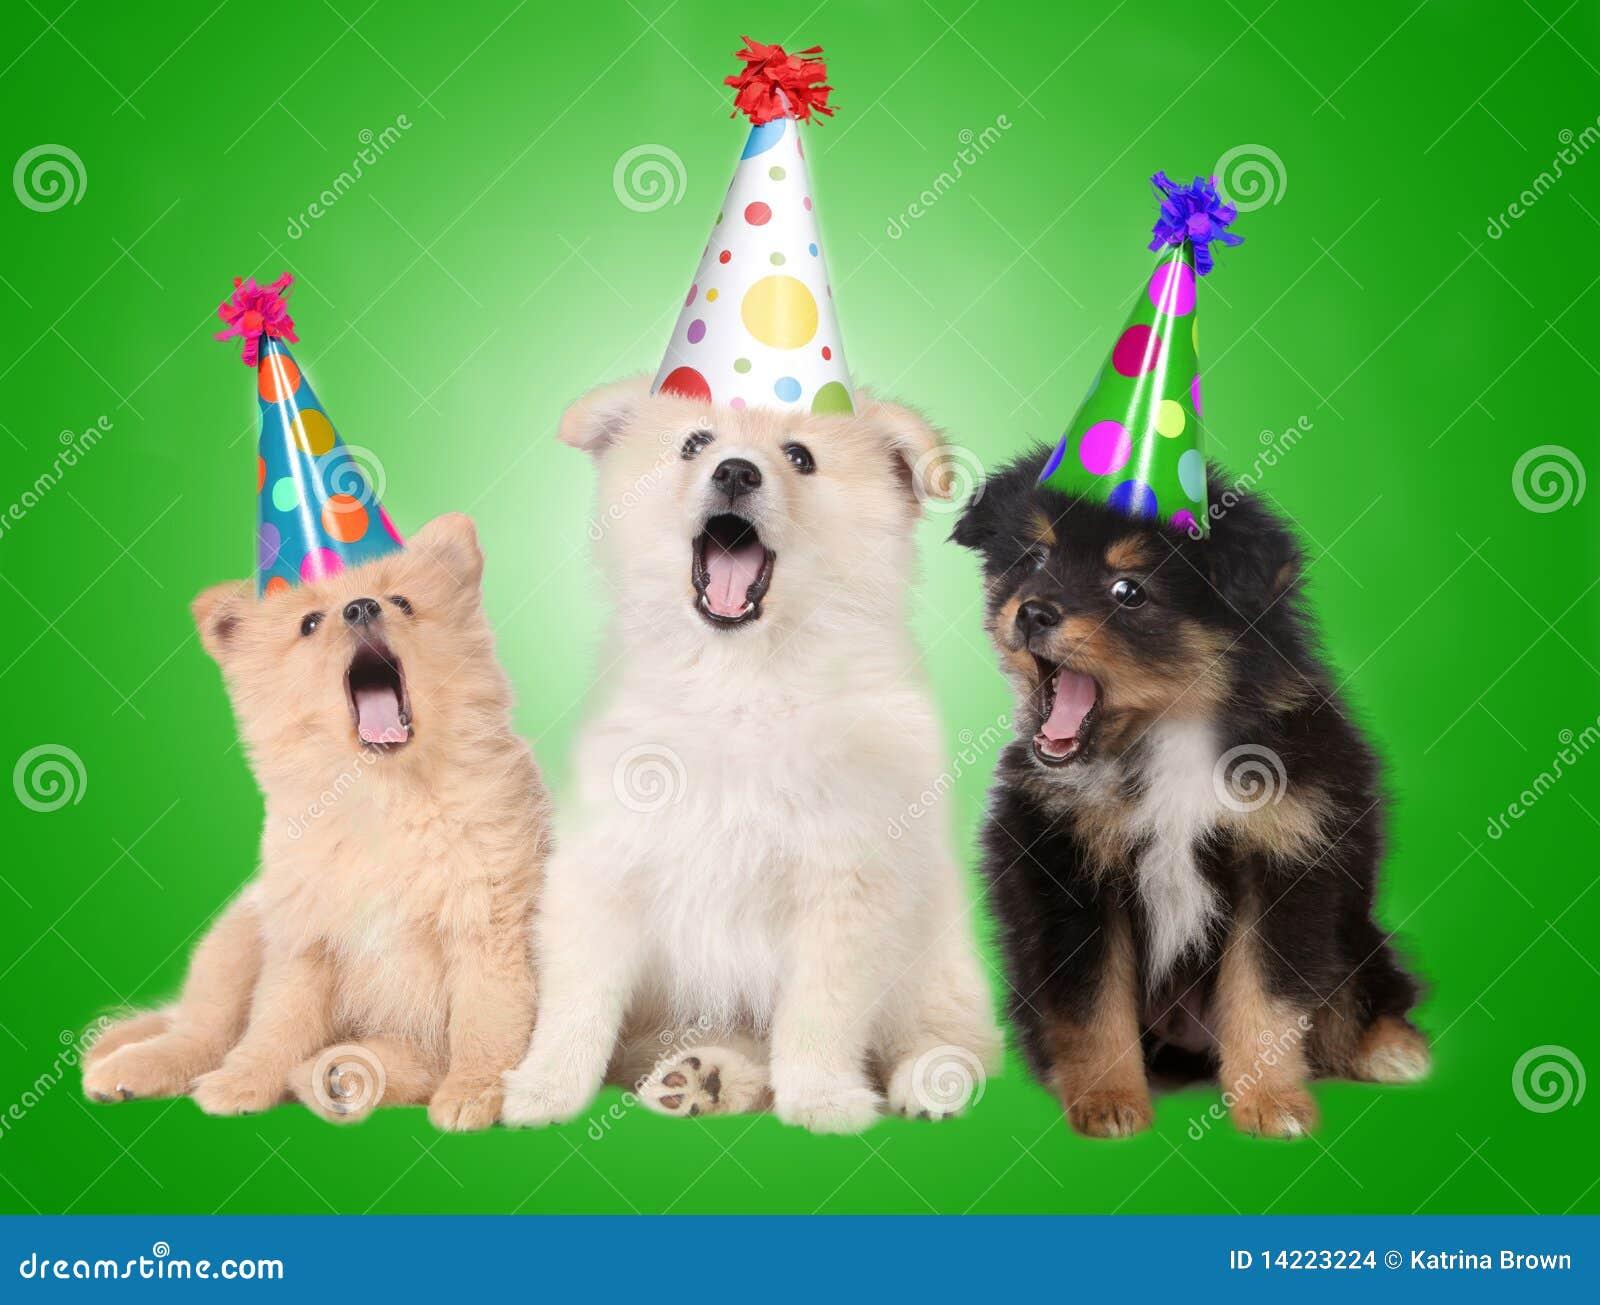 Gesang Geburtstag Welpen Hunde Stockfoto Bild Von Welpe Tier